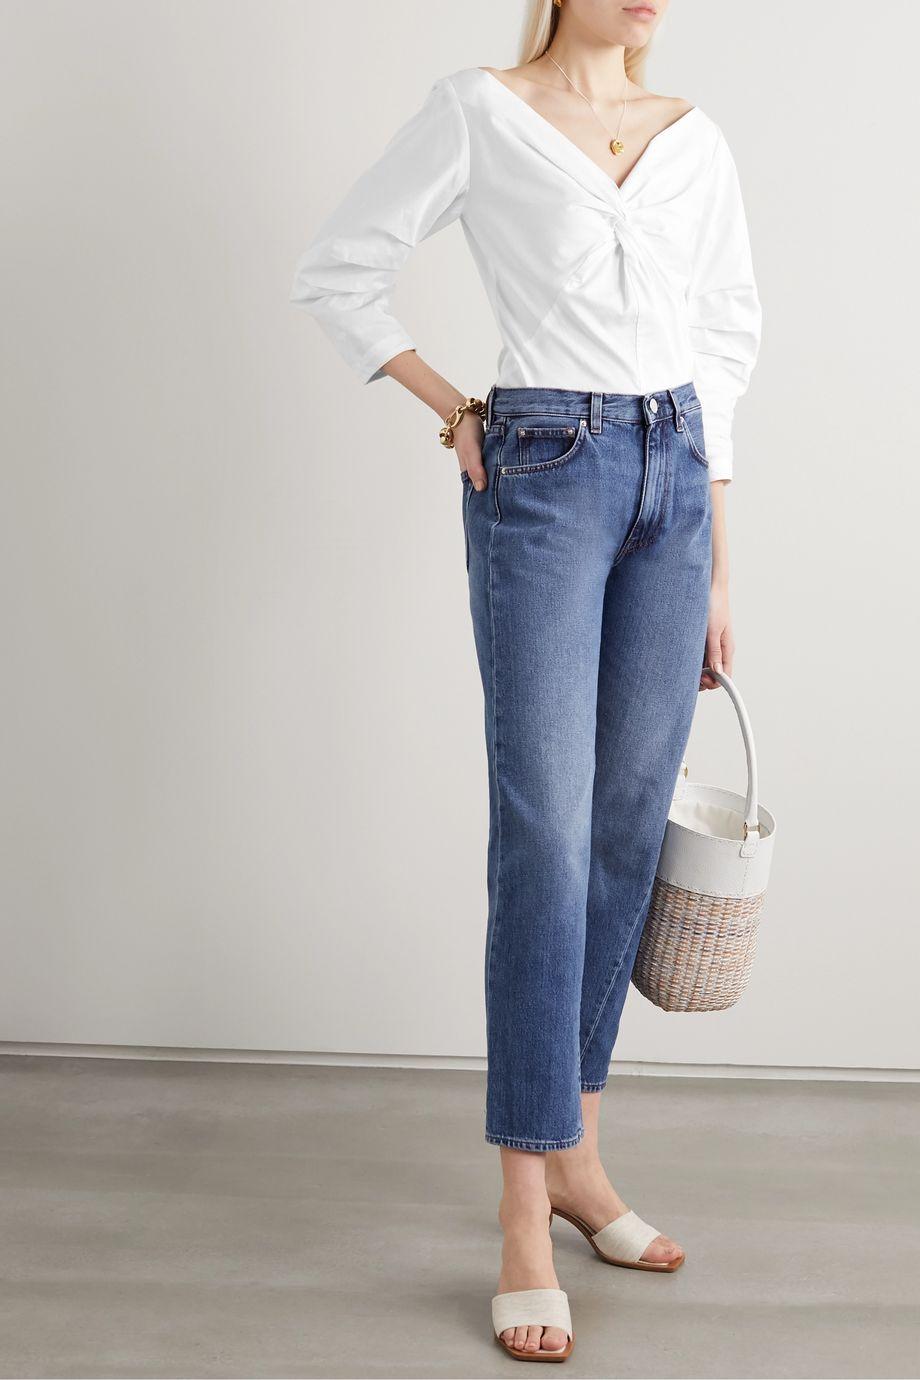 Mara Hoffman + NET SUSTAIN Lela twist-front organic cotton top